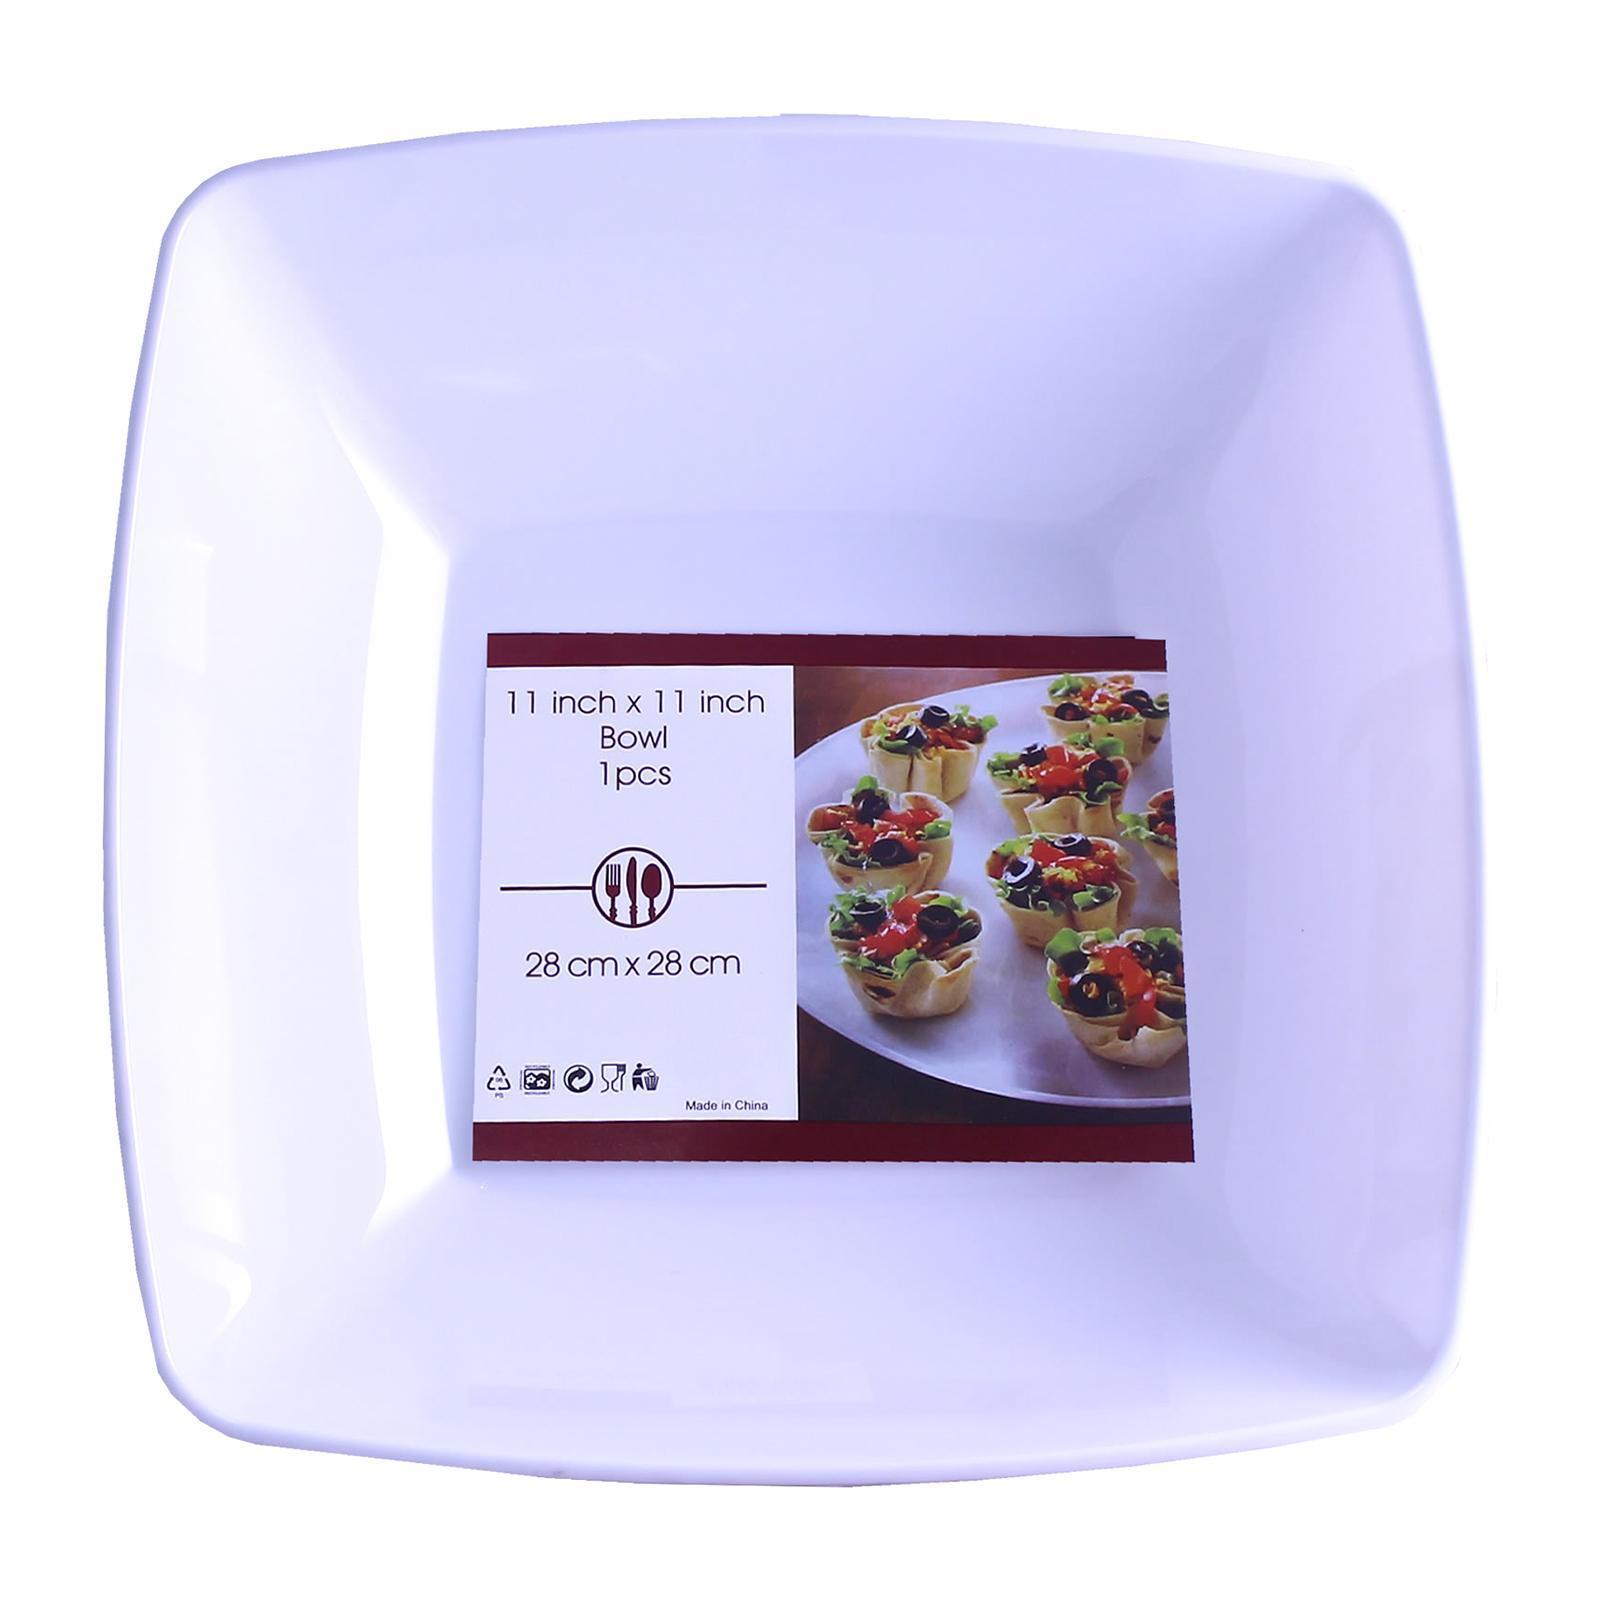 Partyforte 1 PCS Premium Disposable Plastic Tableware - 11 Inch Salad Bowl